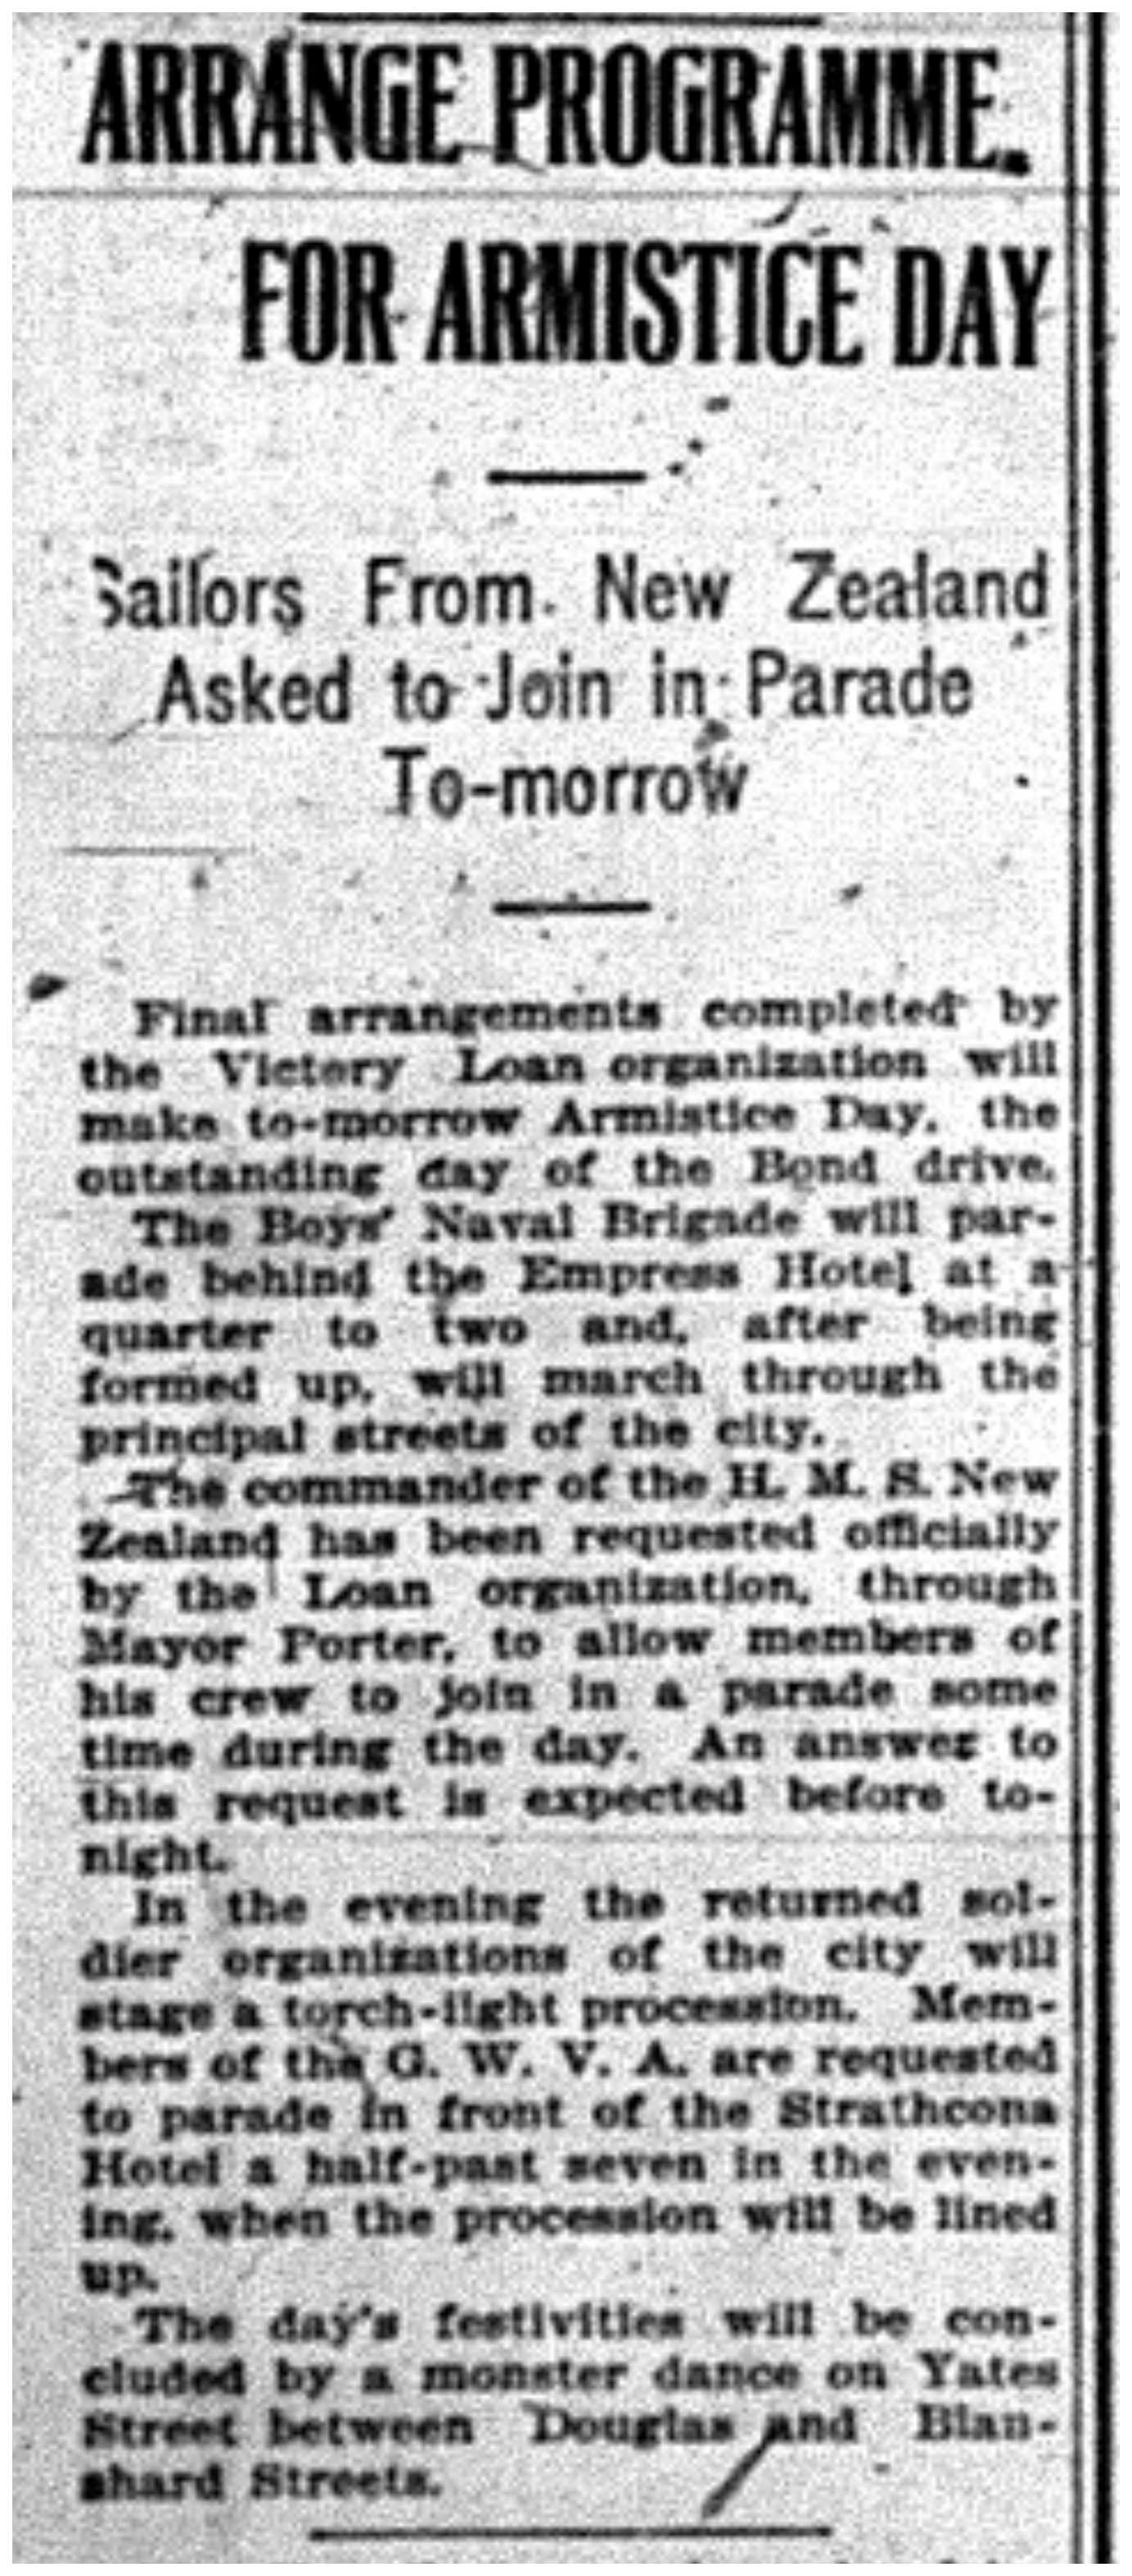 """Arrange Programme For Armistice Day"""